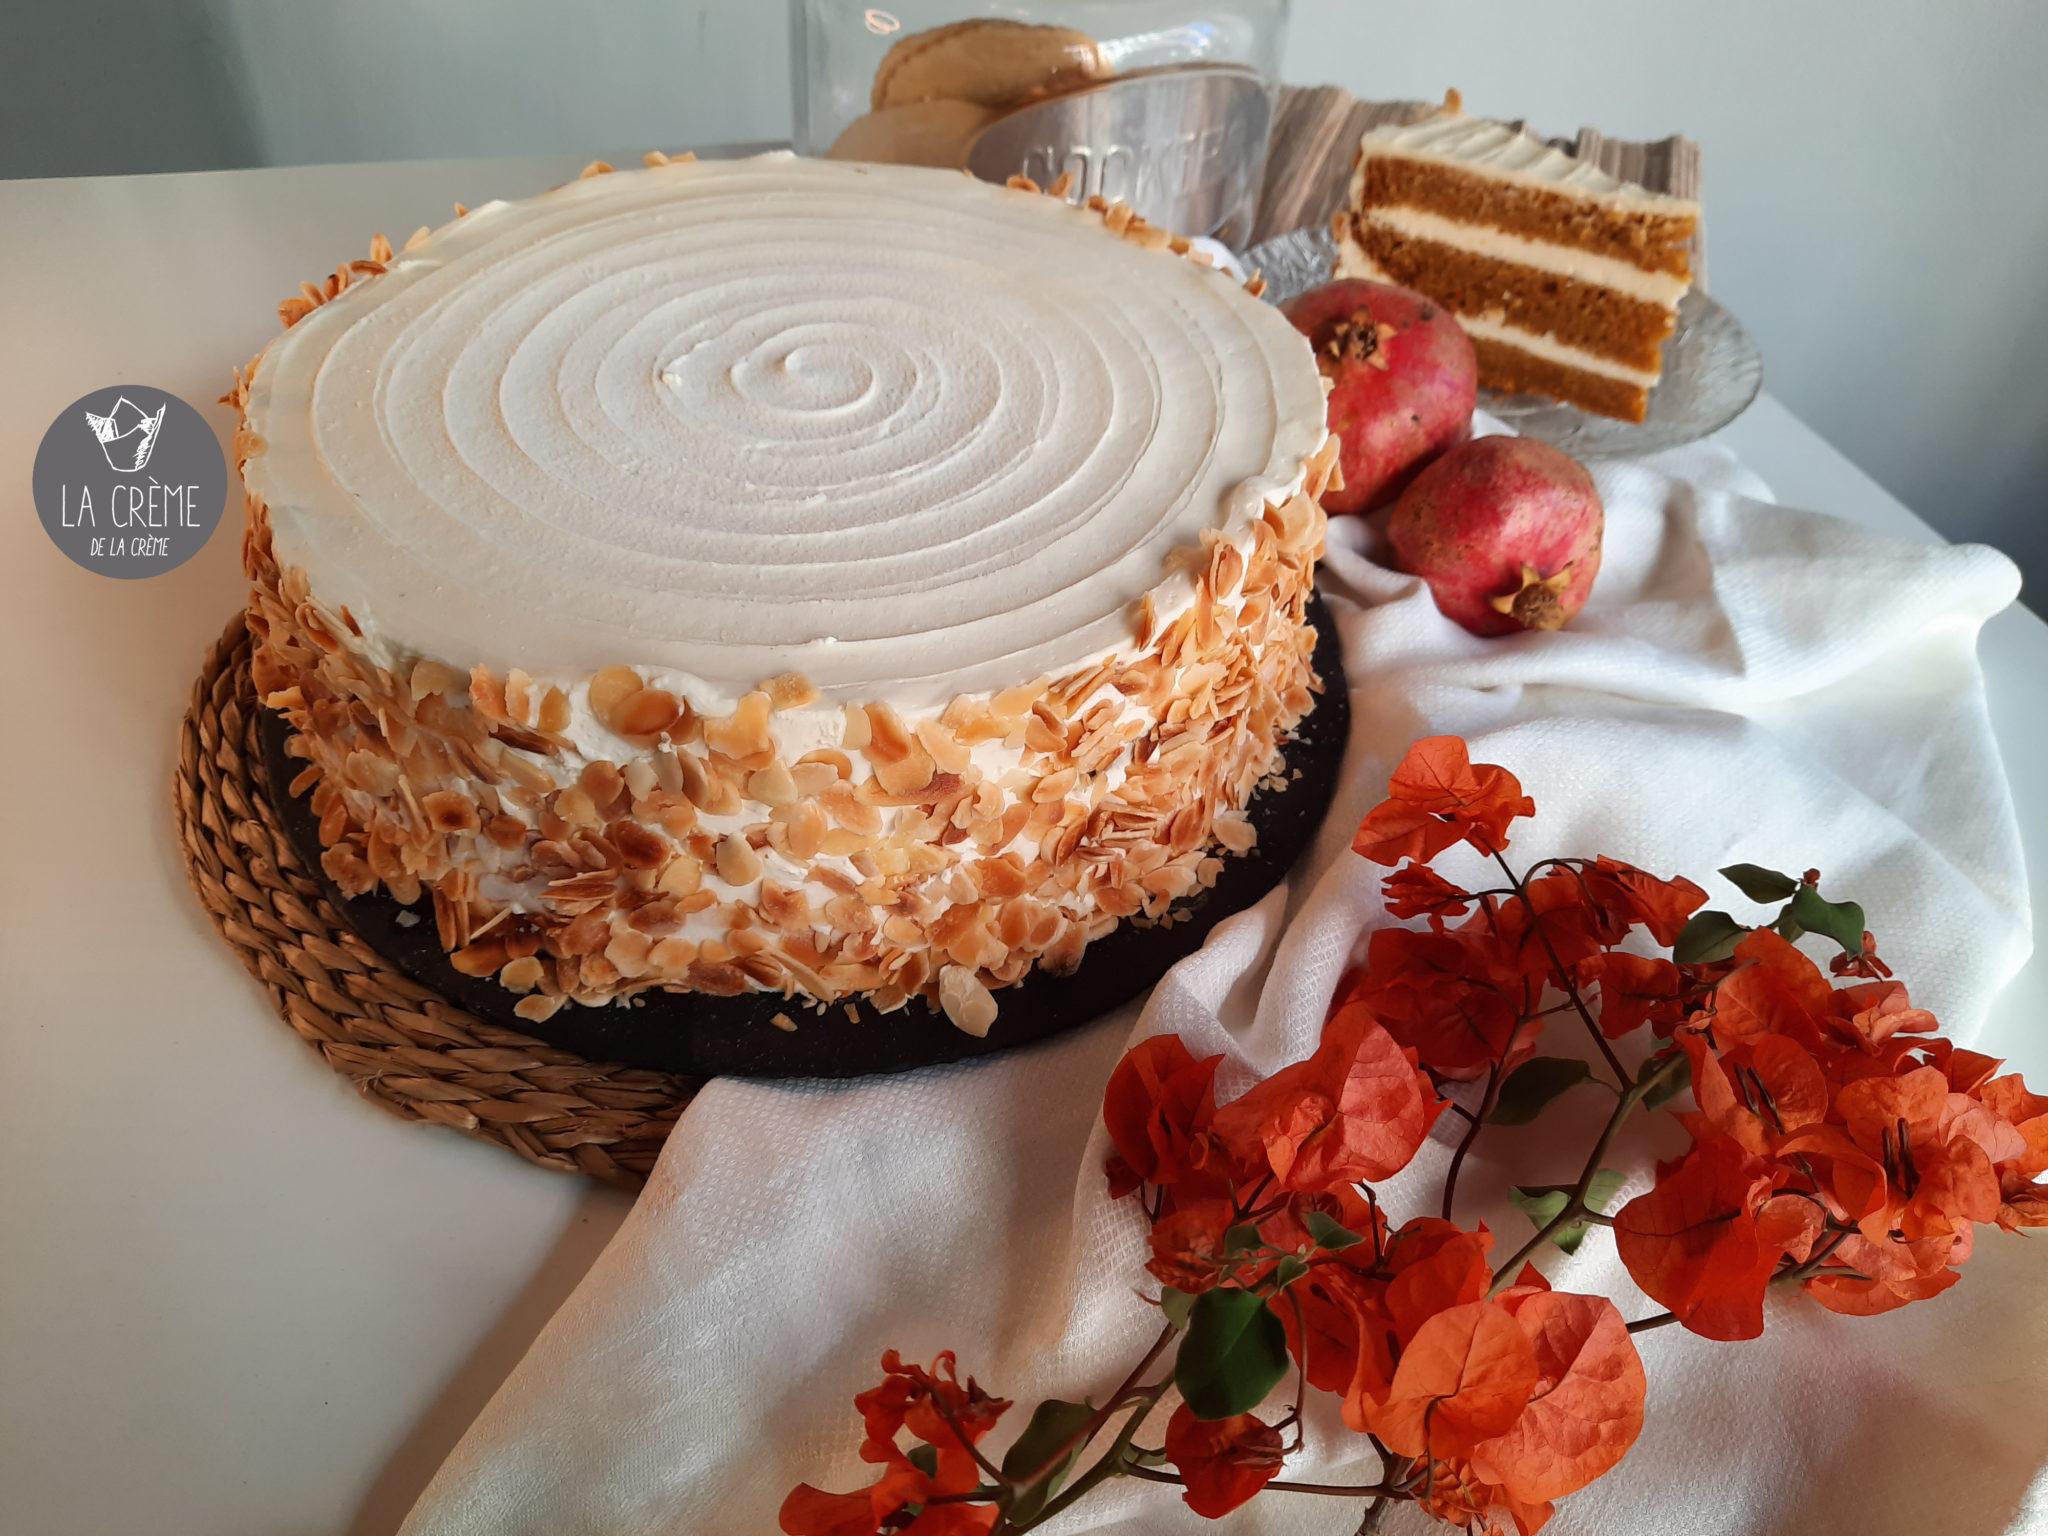 tartas artesanas en sevilla con logo